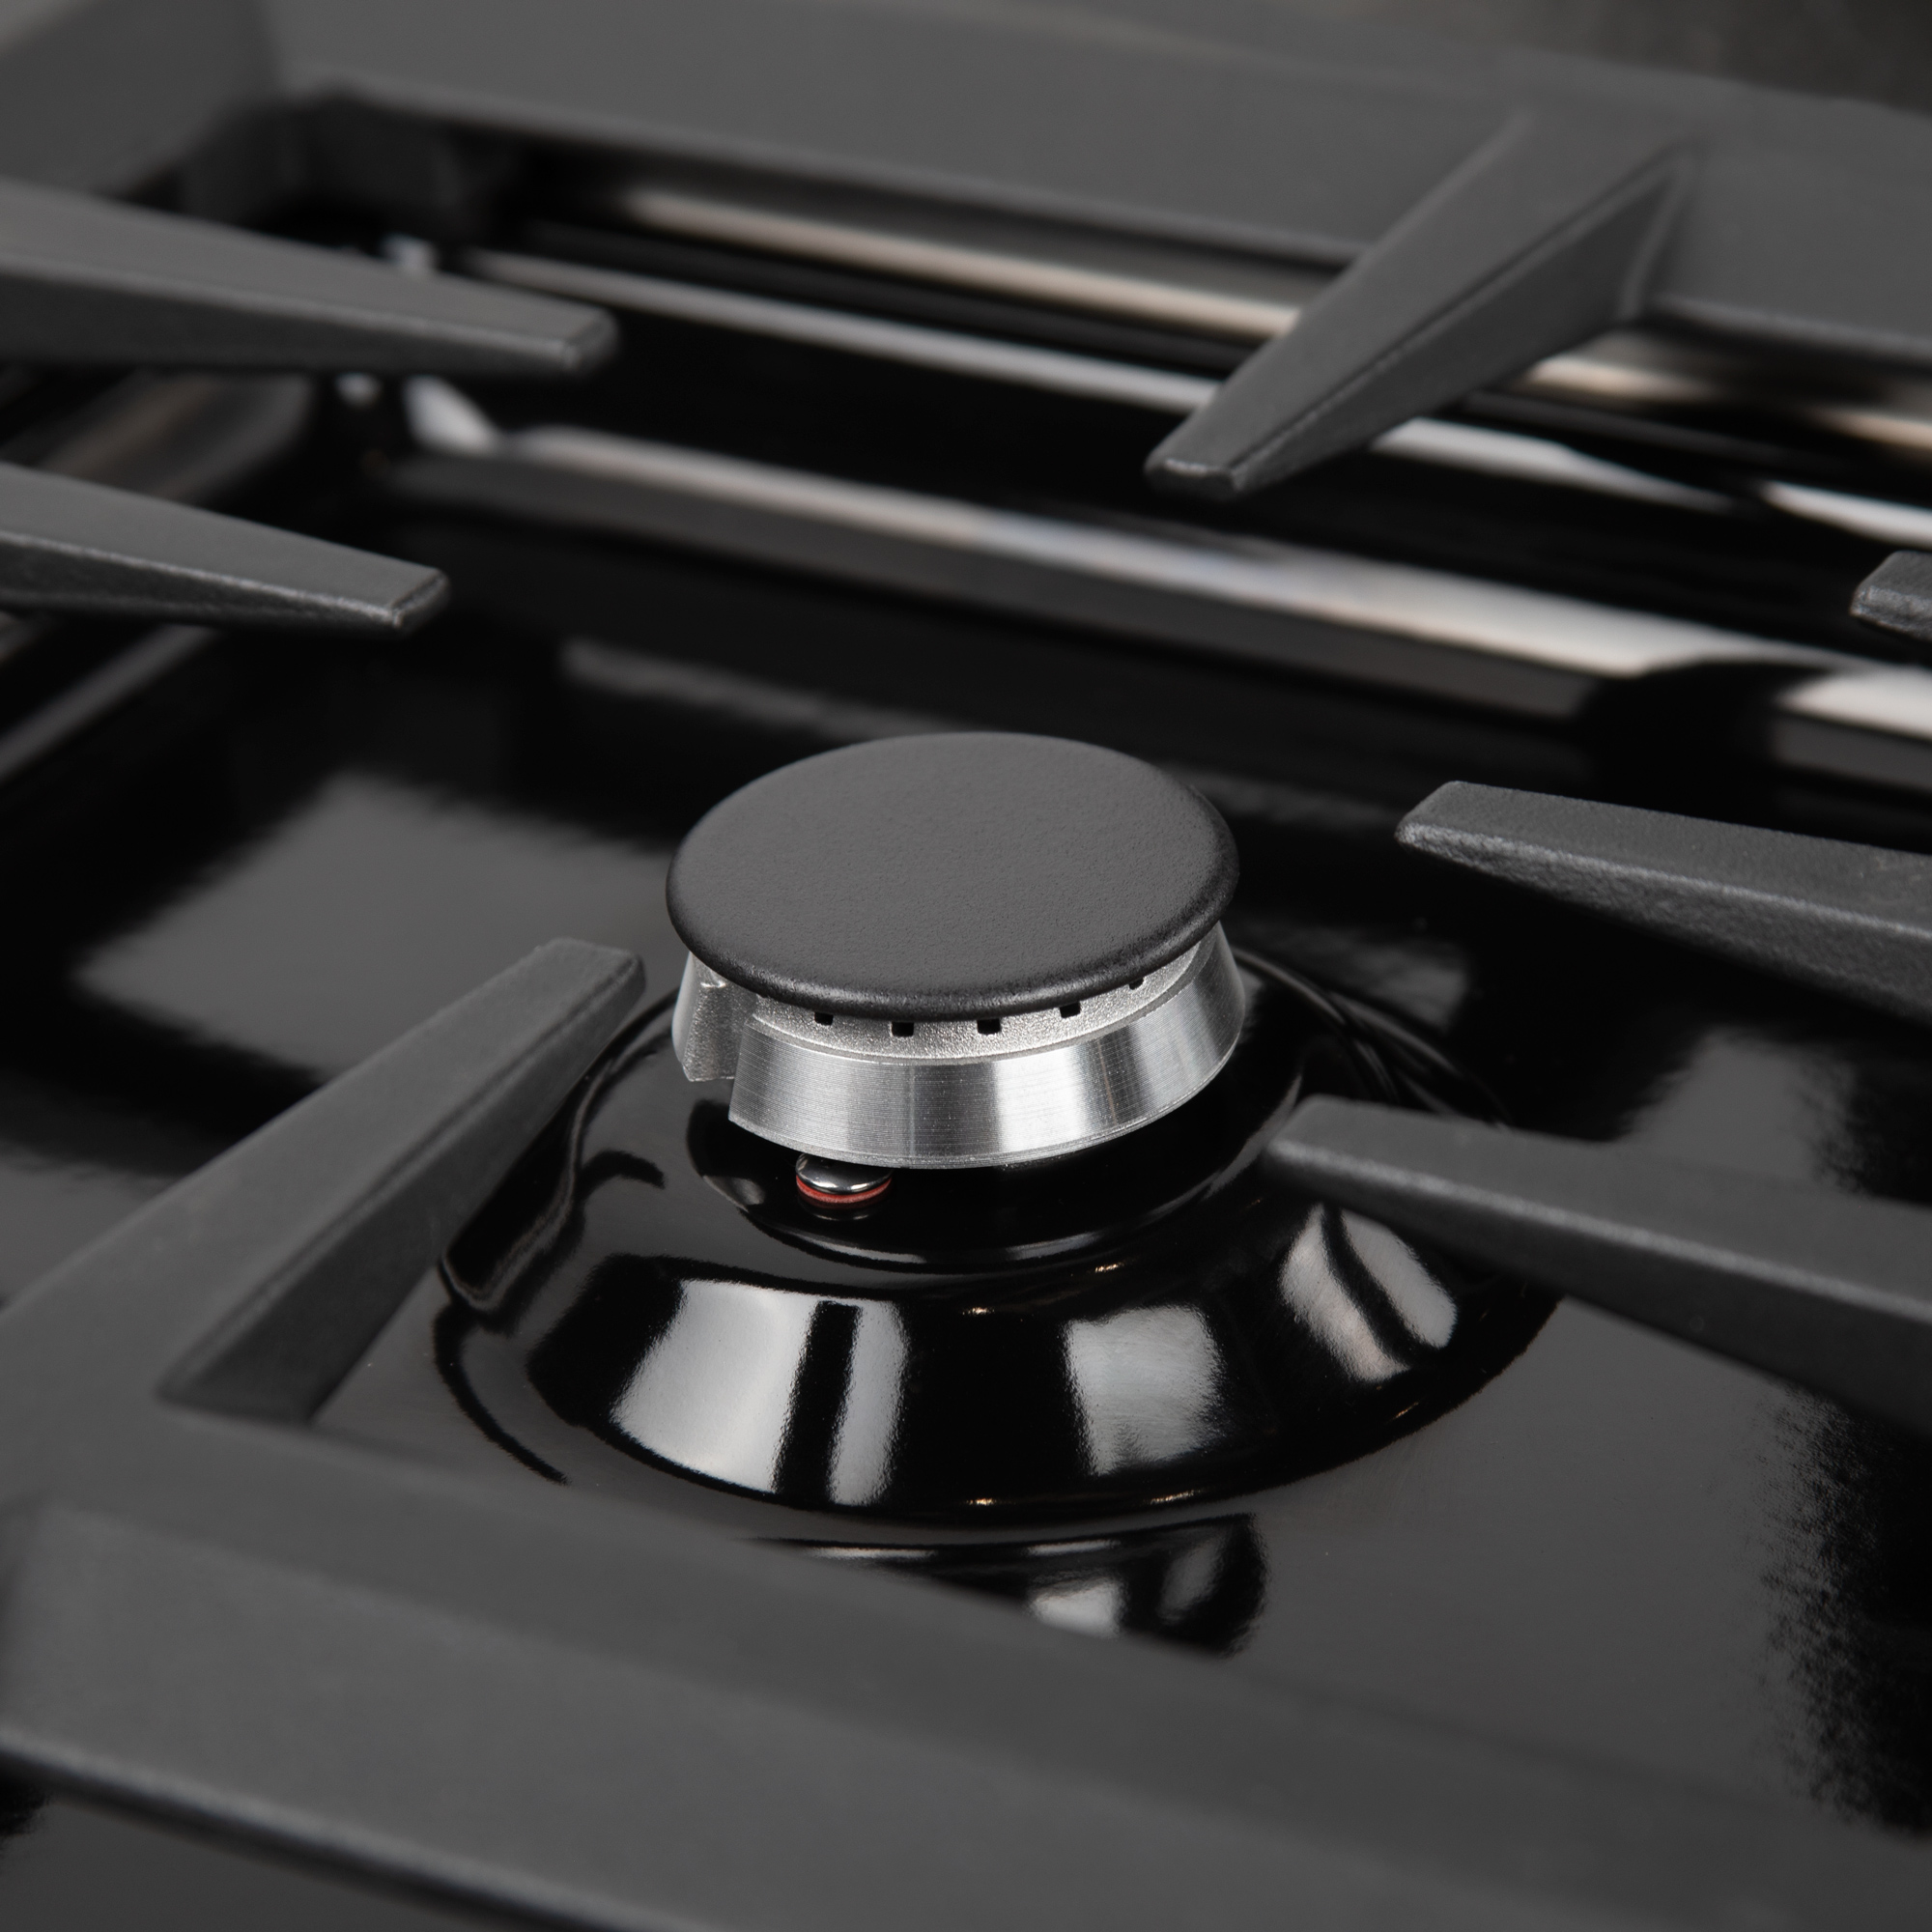 zline-professional-gas-dropin-cooktop-RC30-PBT-closeup1.jpg